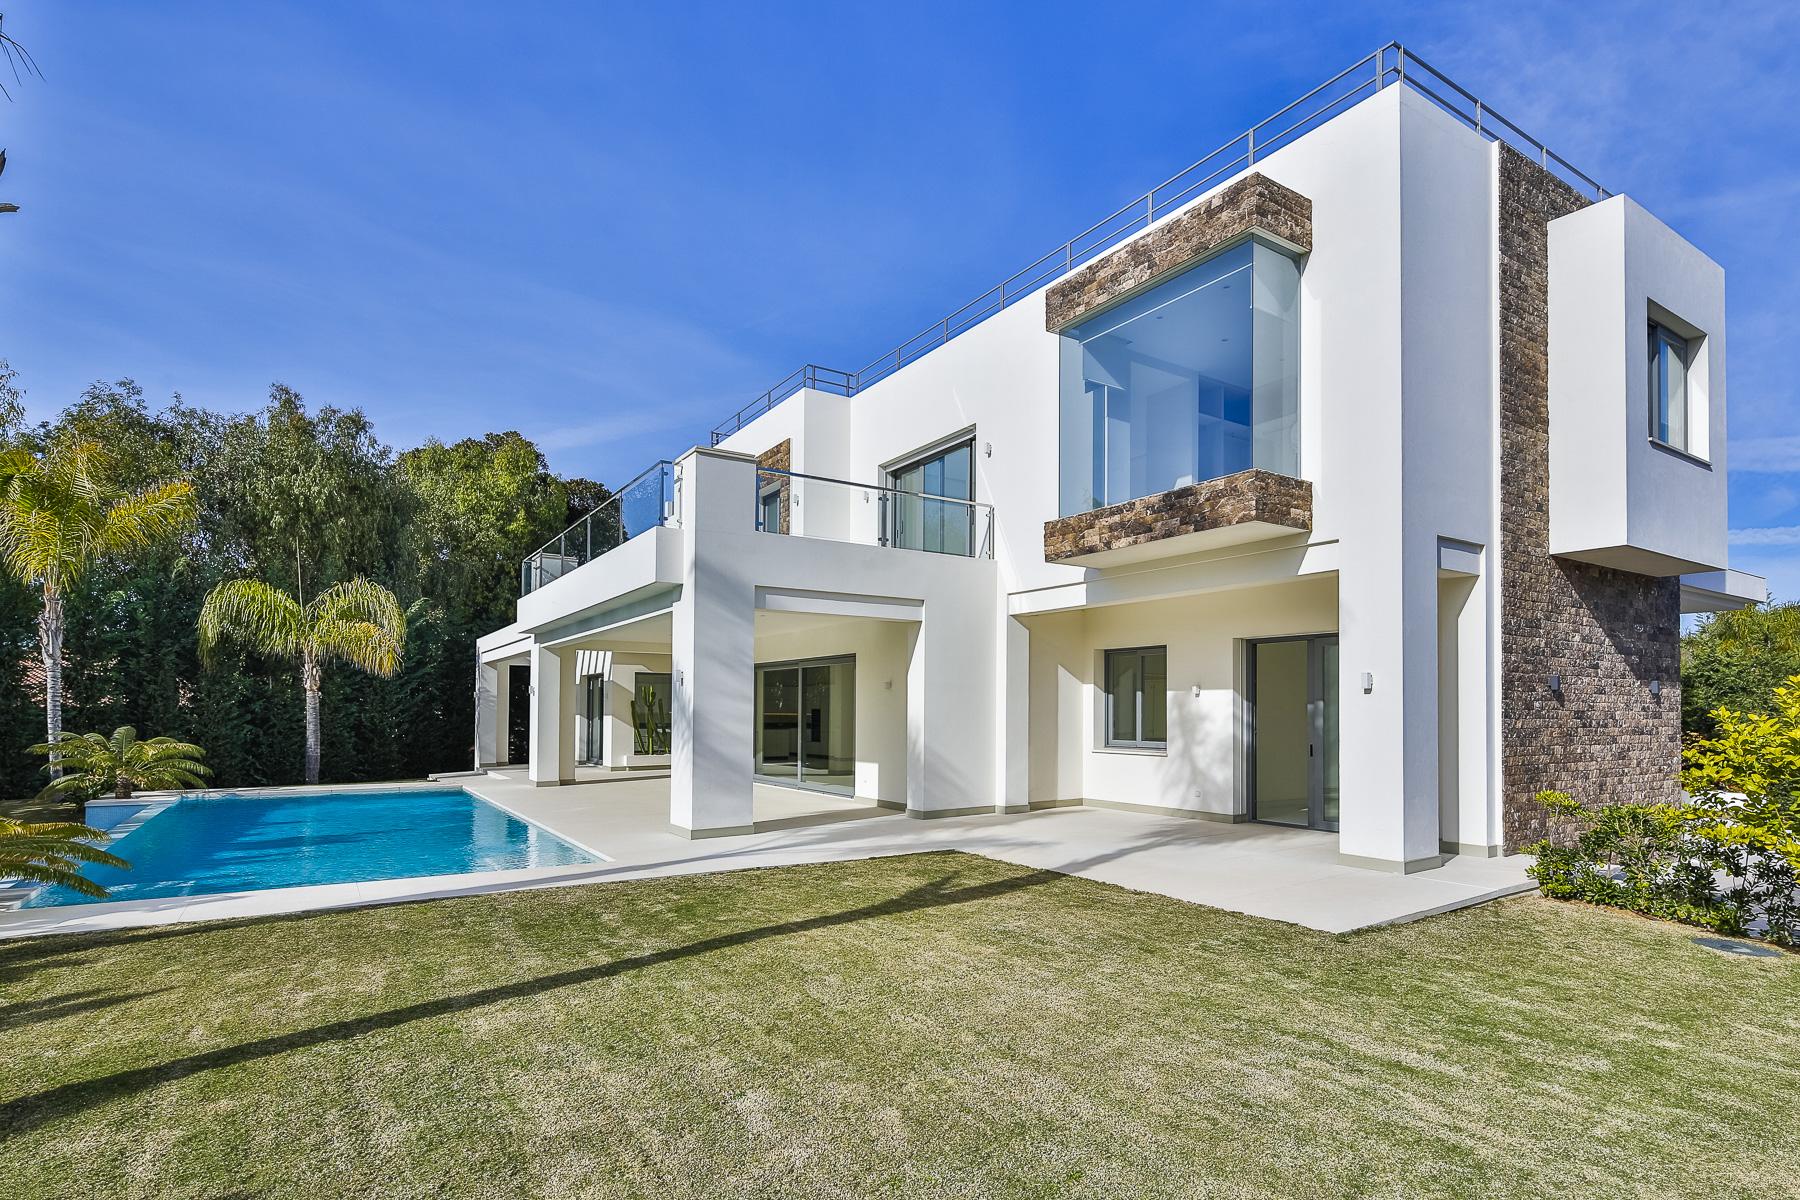 Single Family Homes for Sale at Beachside brand new villa Guadalmina area Guadalmina, Malaga Spain